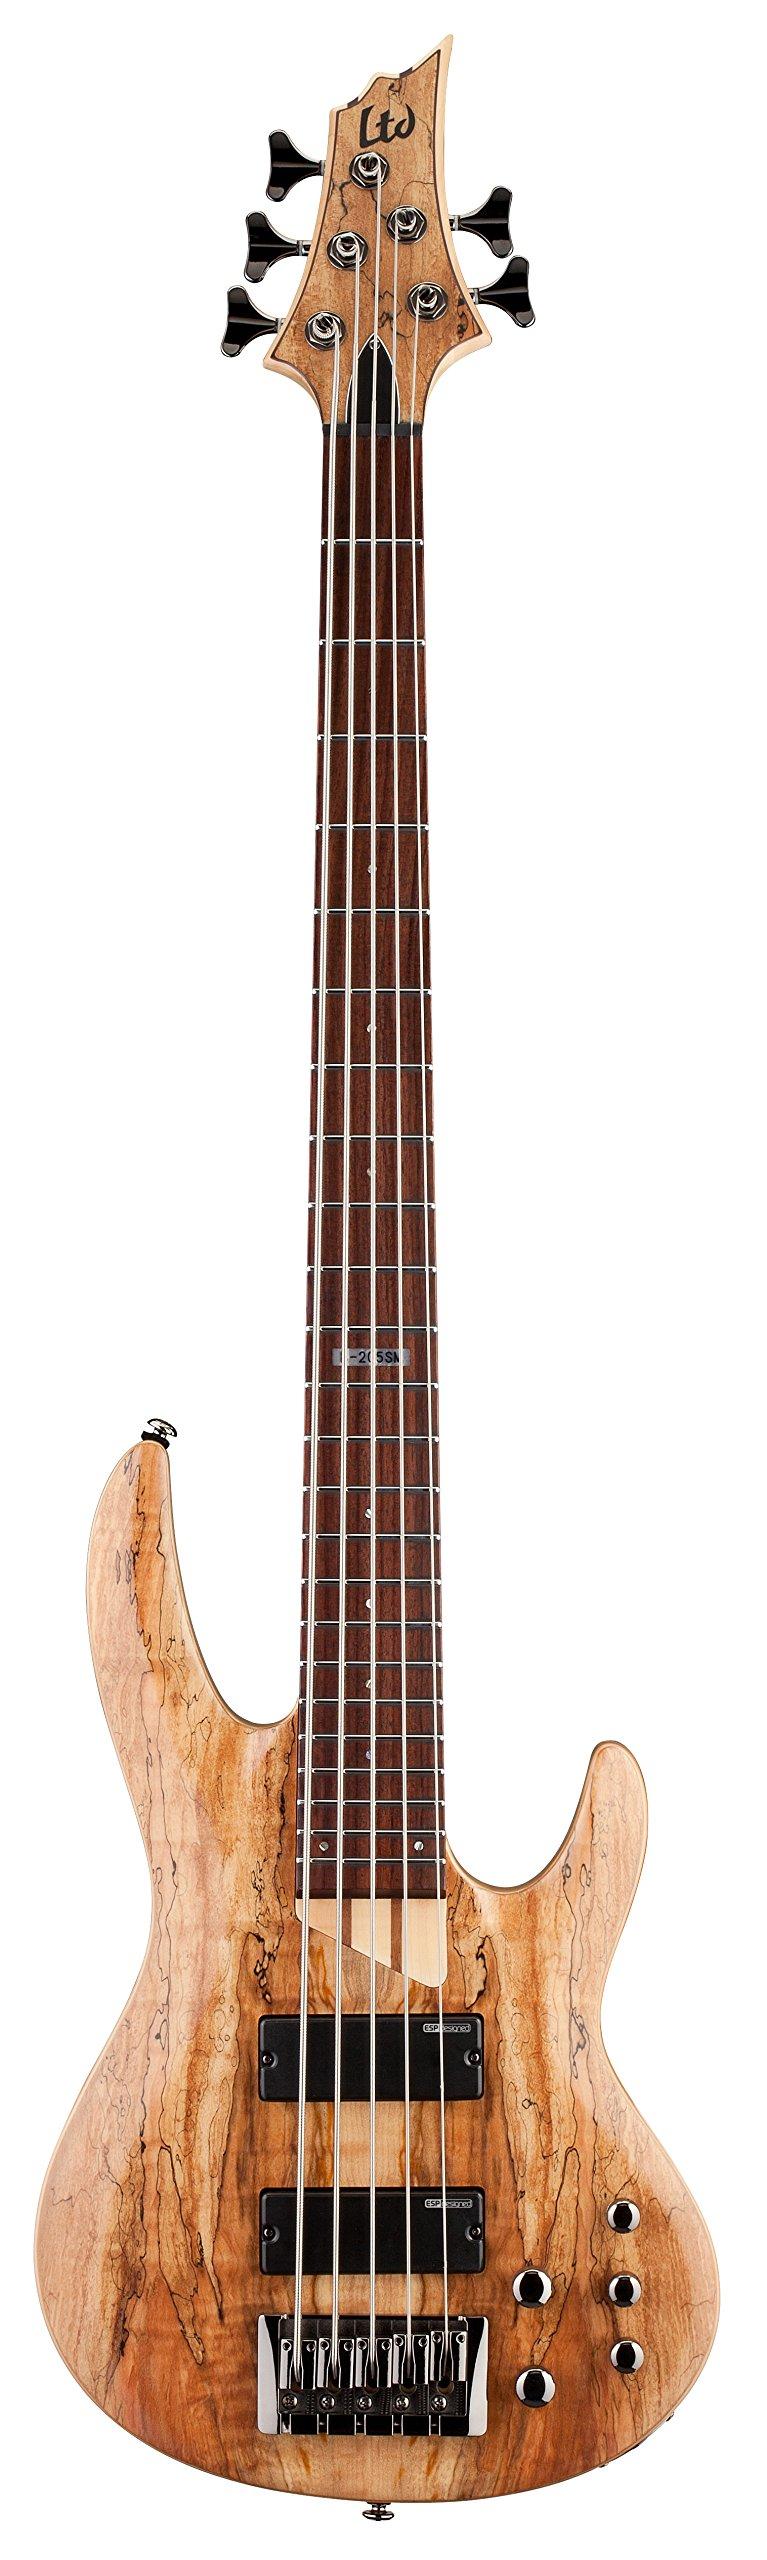 ESP LTD B-205SM Spalted Maple Five-String Bass Guitar, Natural Satin